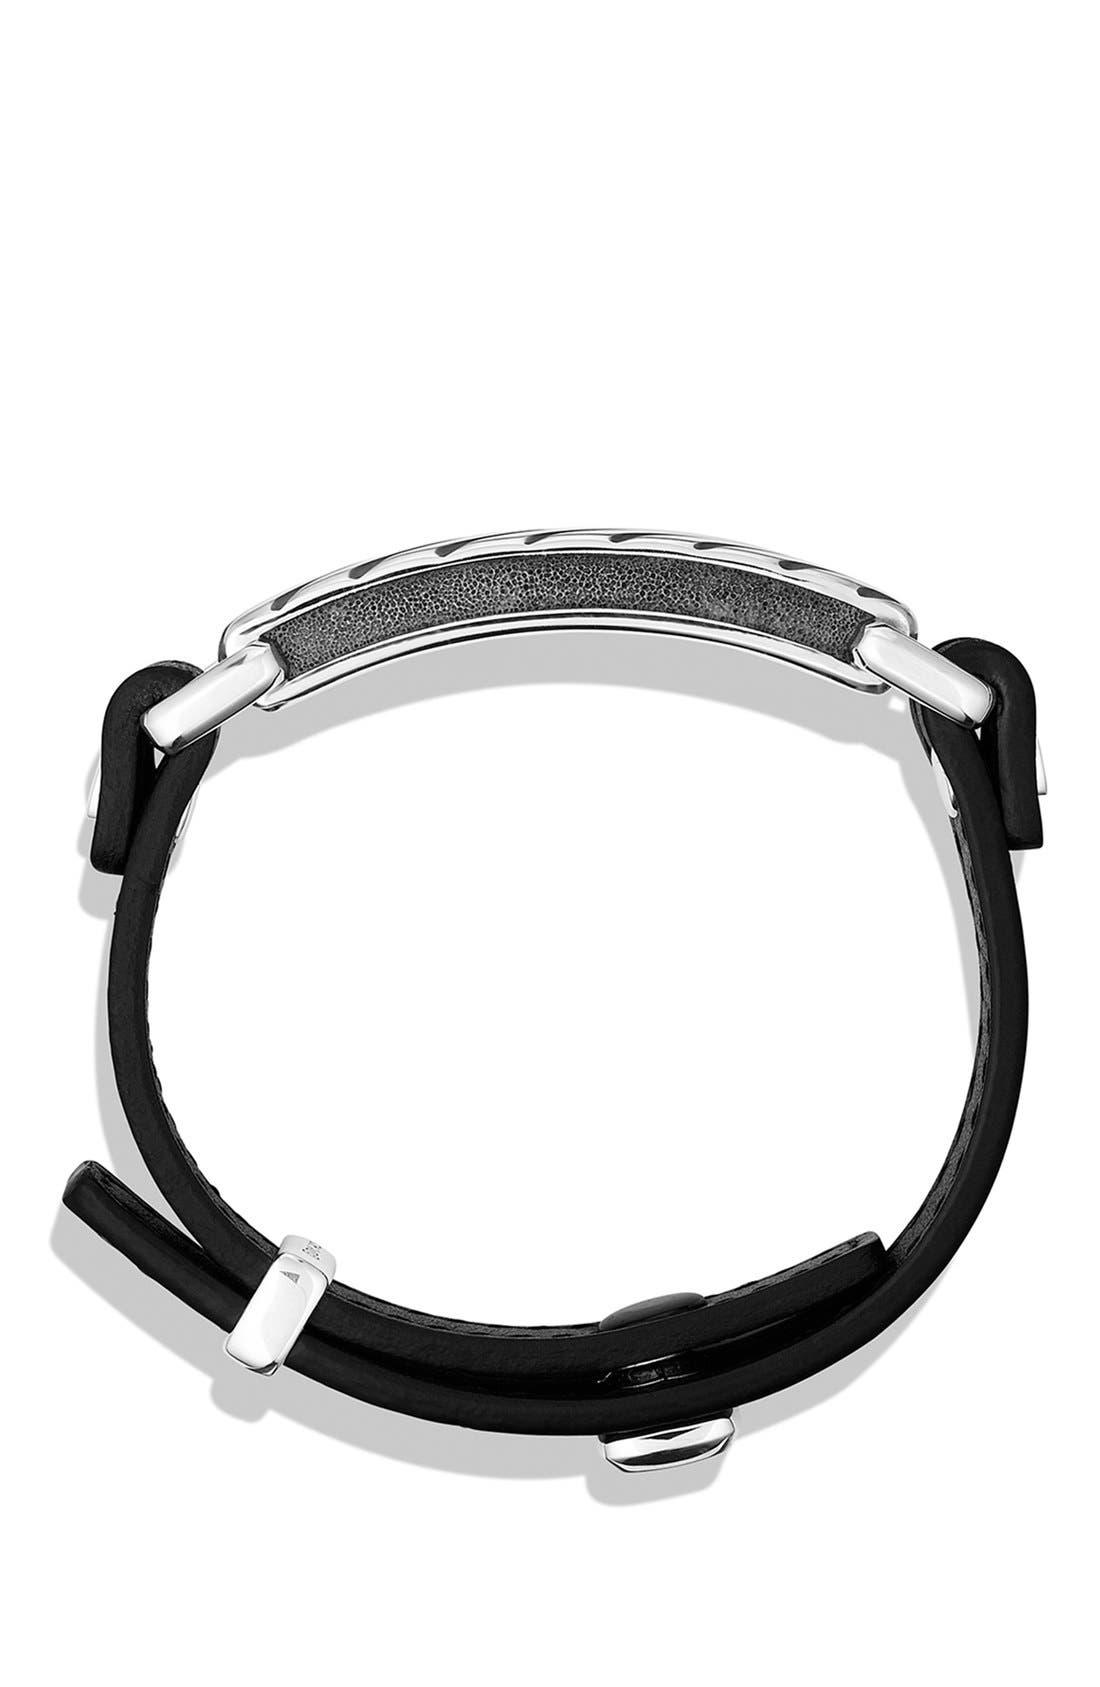 Modern Cable ID Bracelet,                             Alternate thumbnail 2, color,                             BLACK